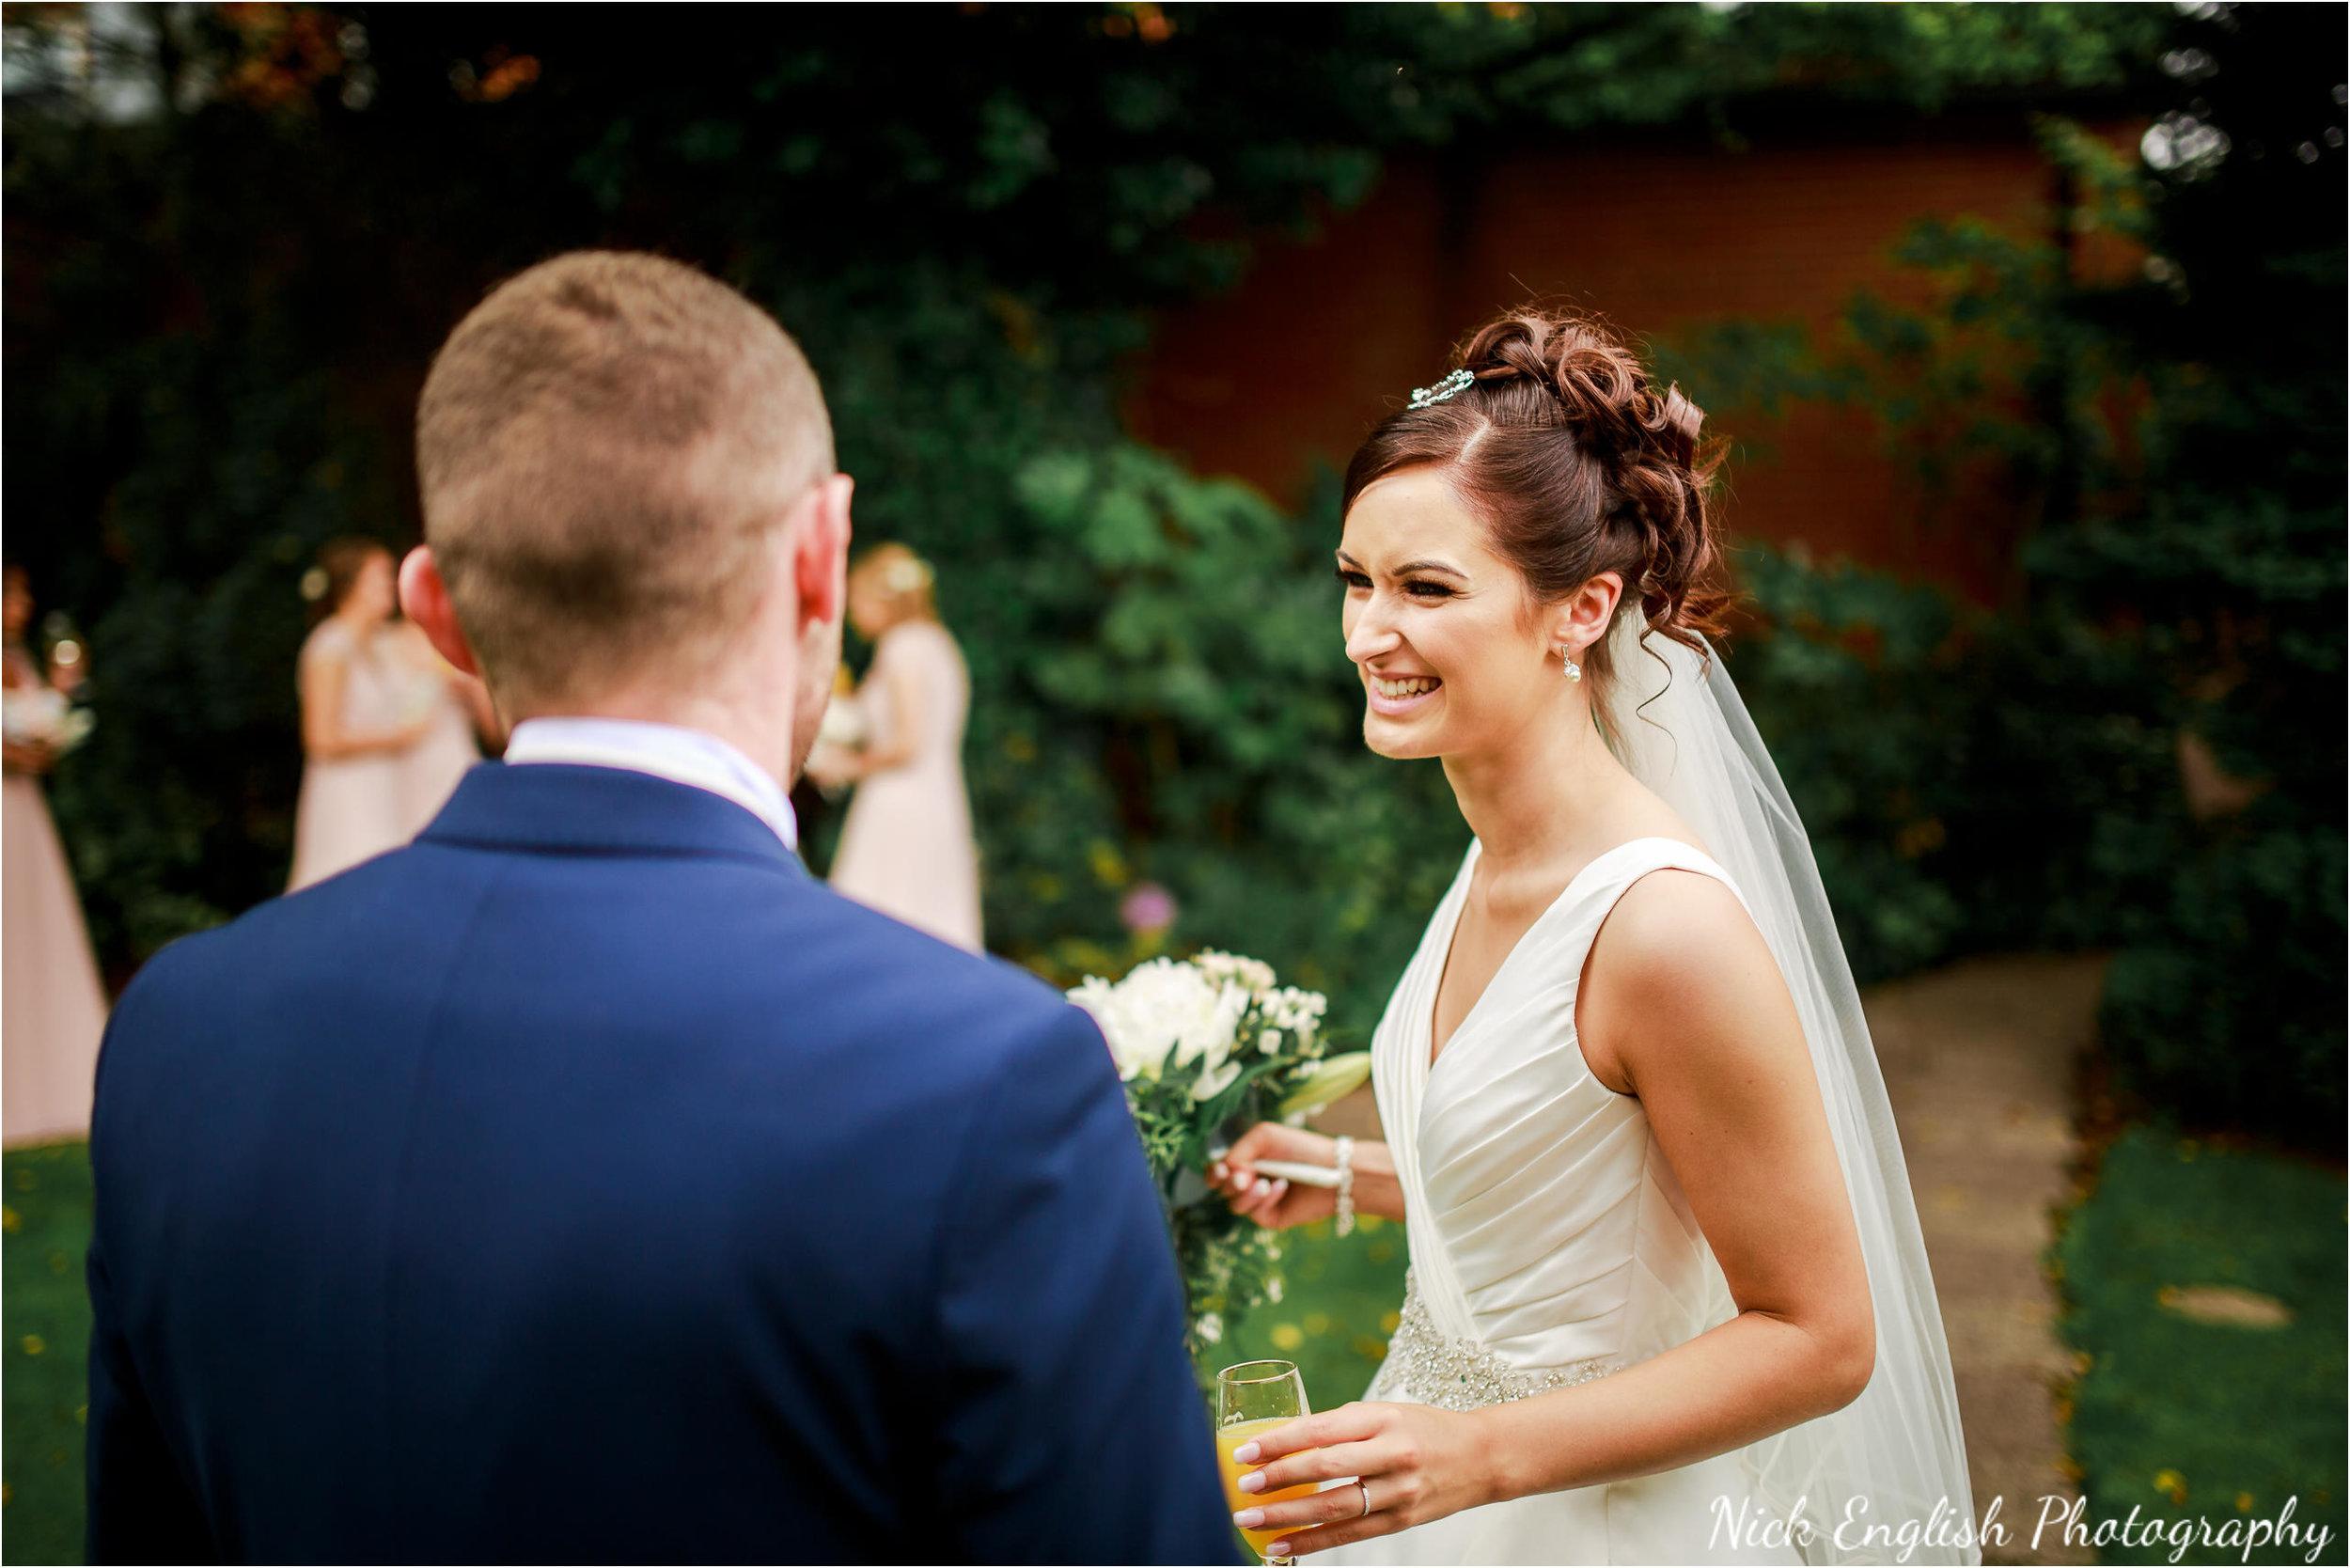 Emily David Wedding Photographs at Barton Grange Preston by Nick English Photography 92jpg.jpeg